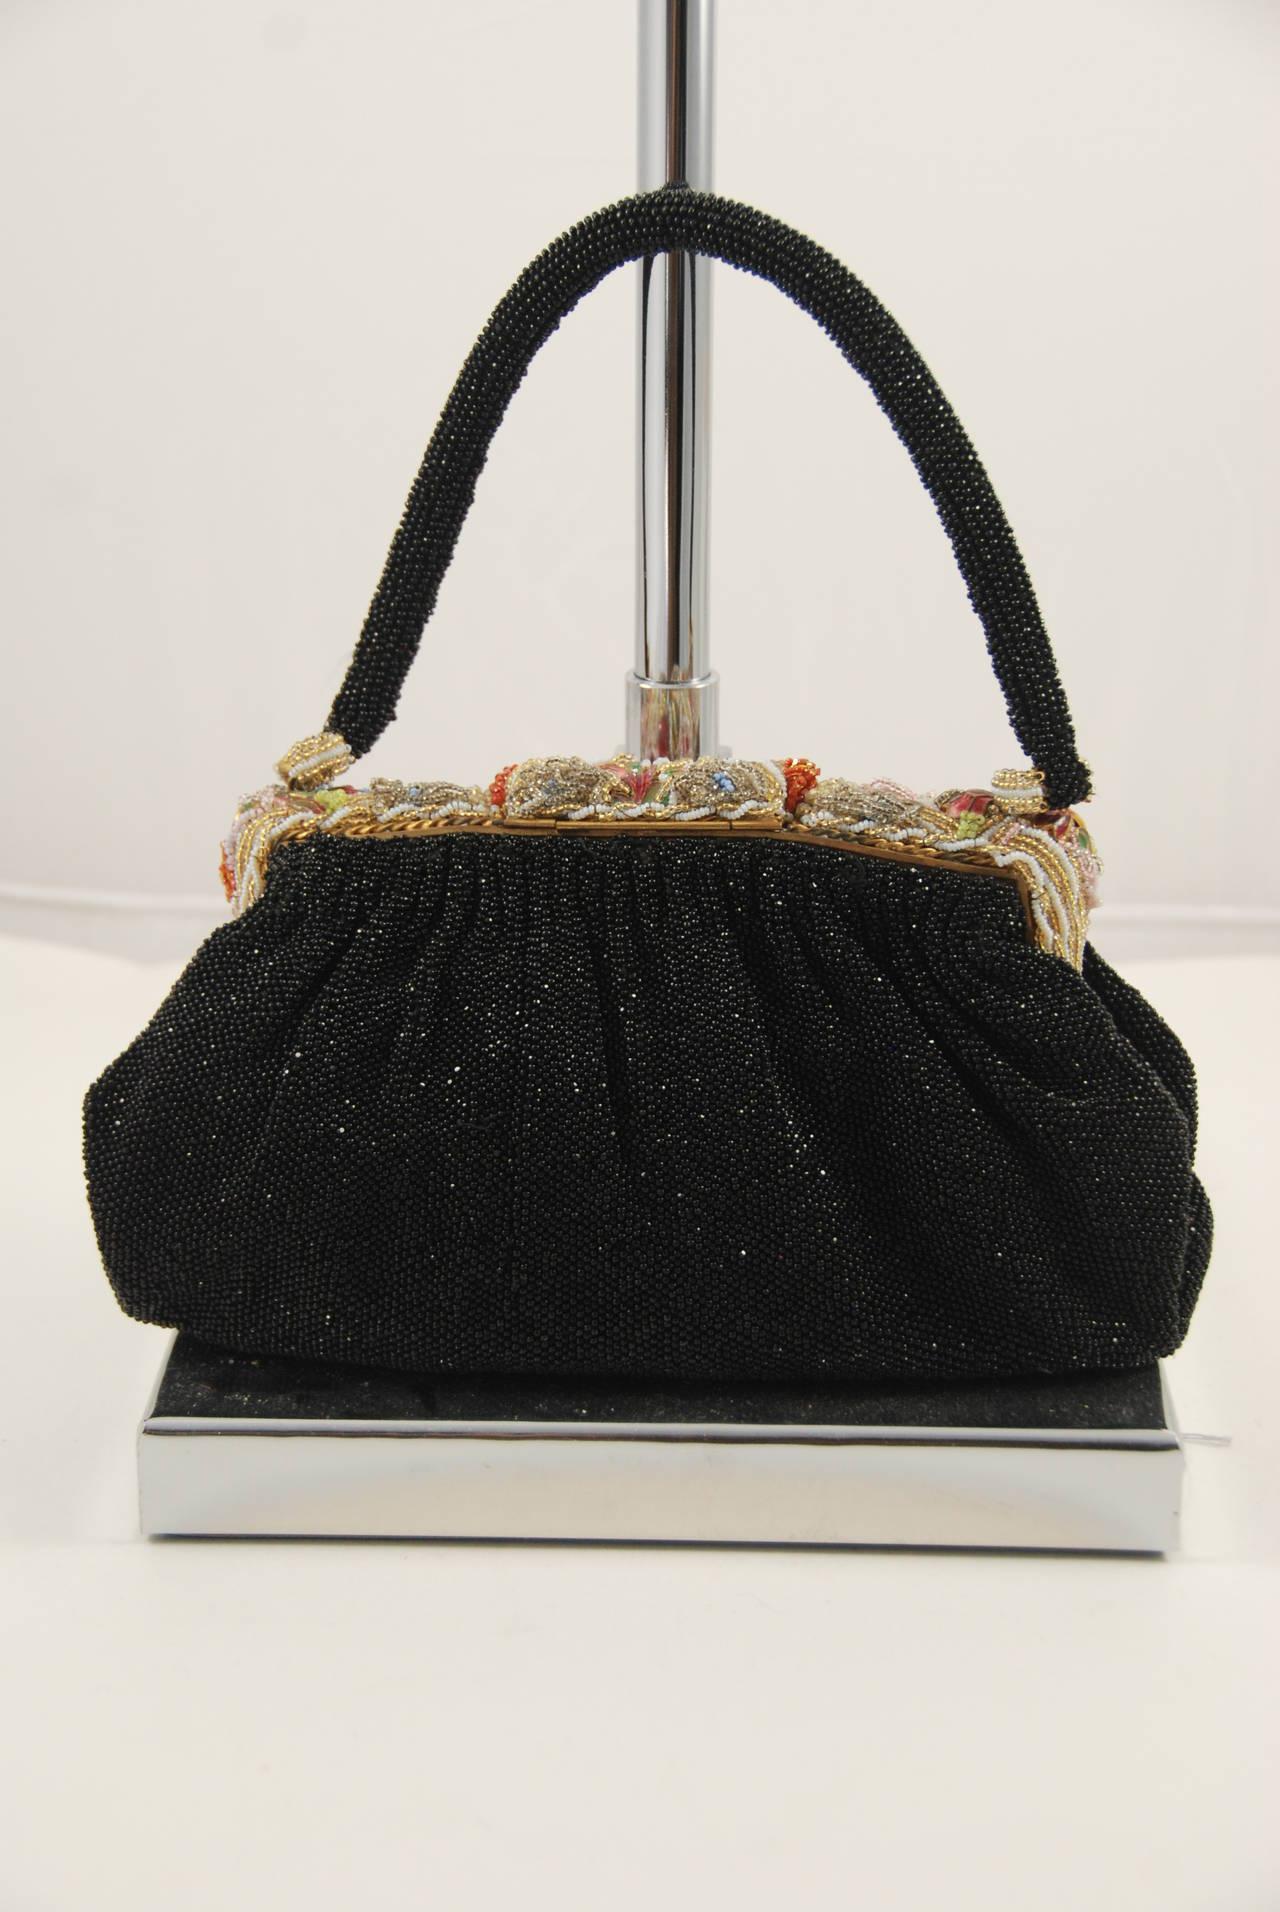 yves saint laurent bags uk - 1940s Black Beaded Evening Bag with Ornate Frame at 1stdibs